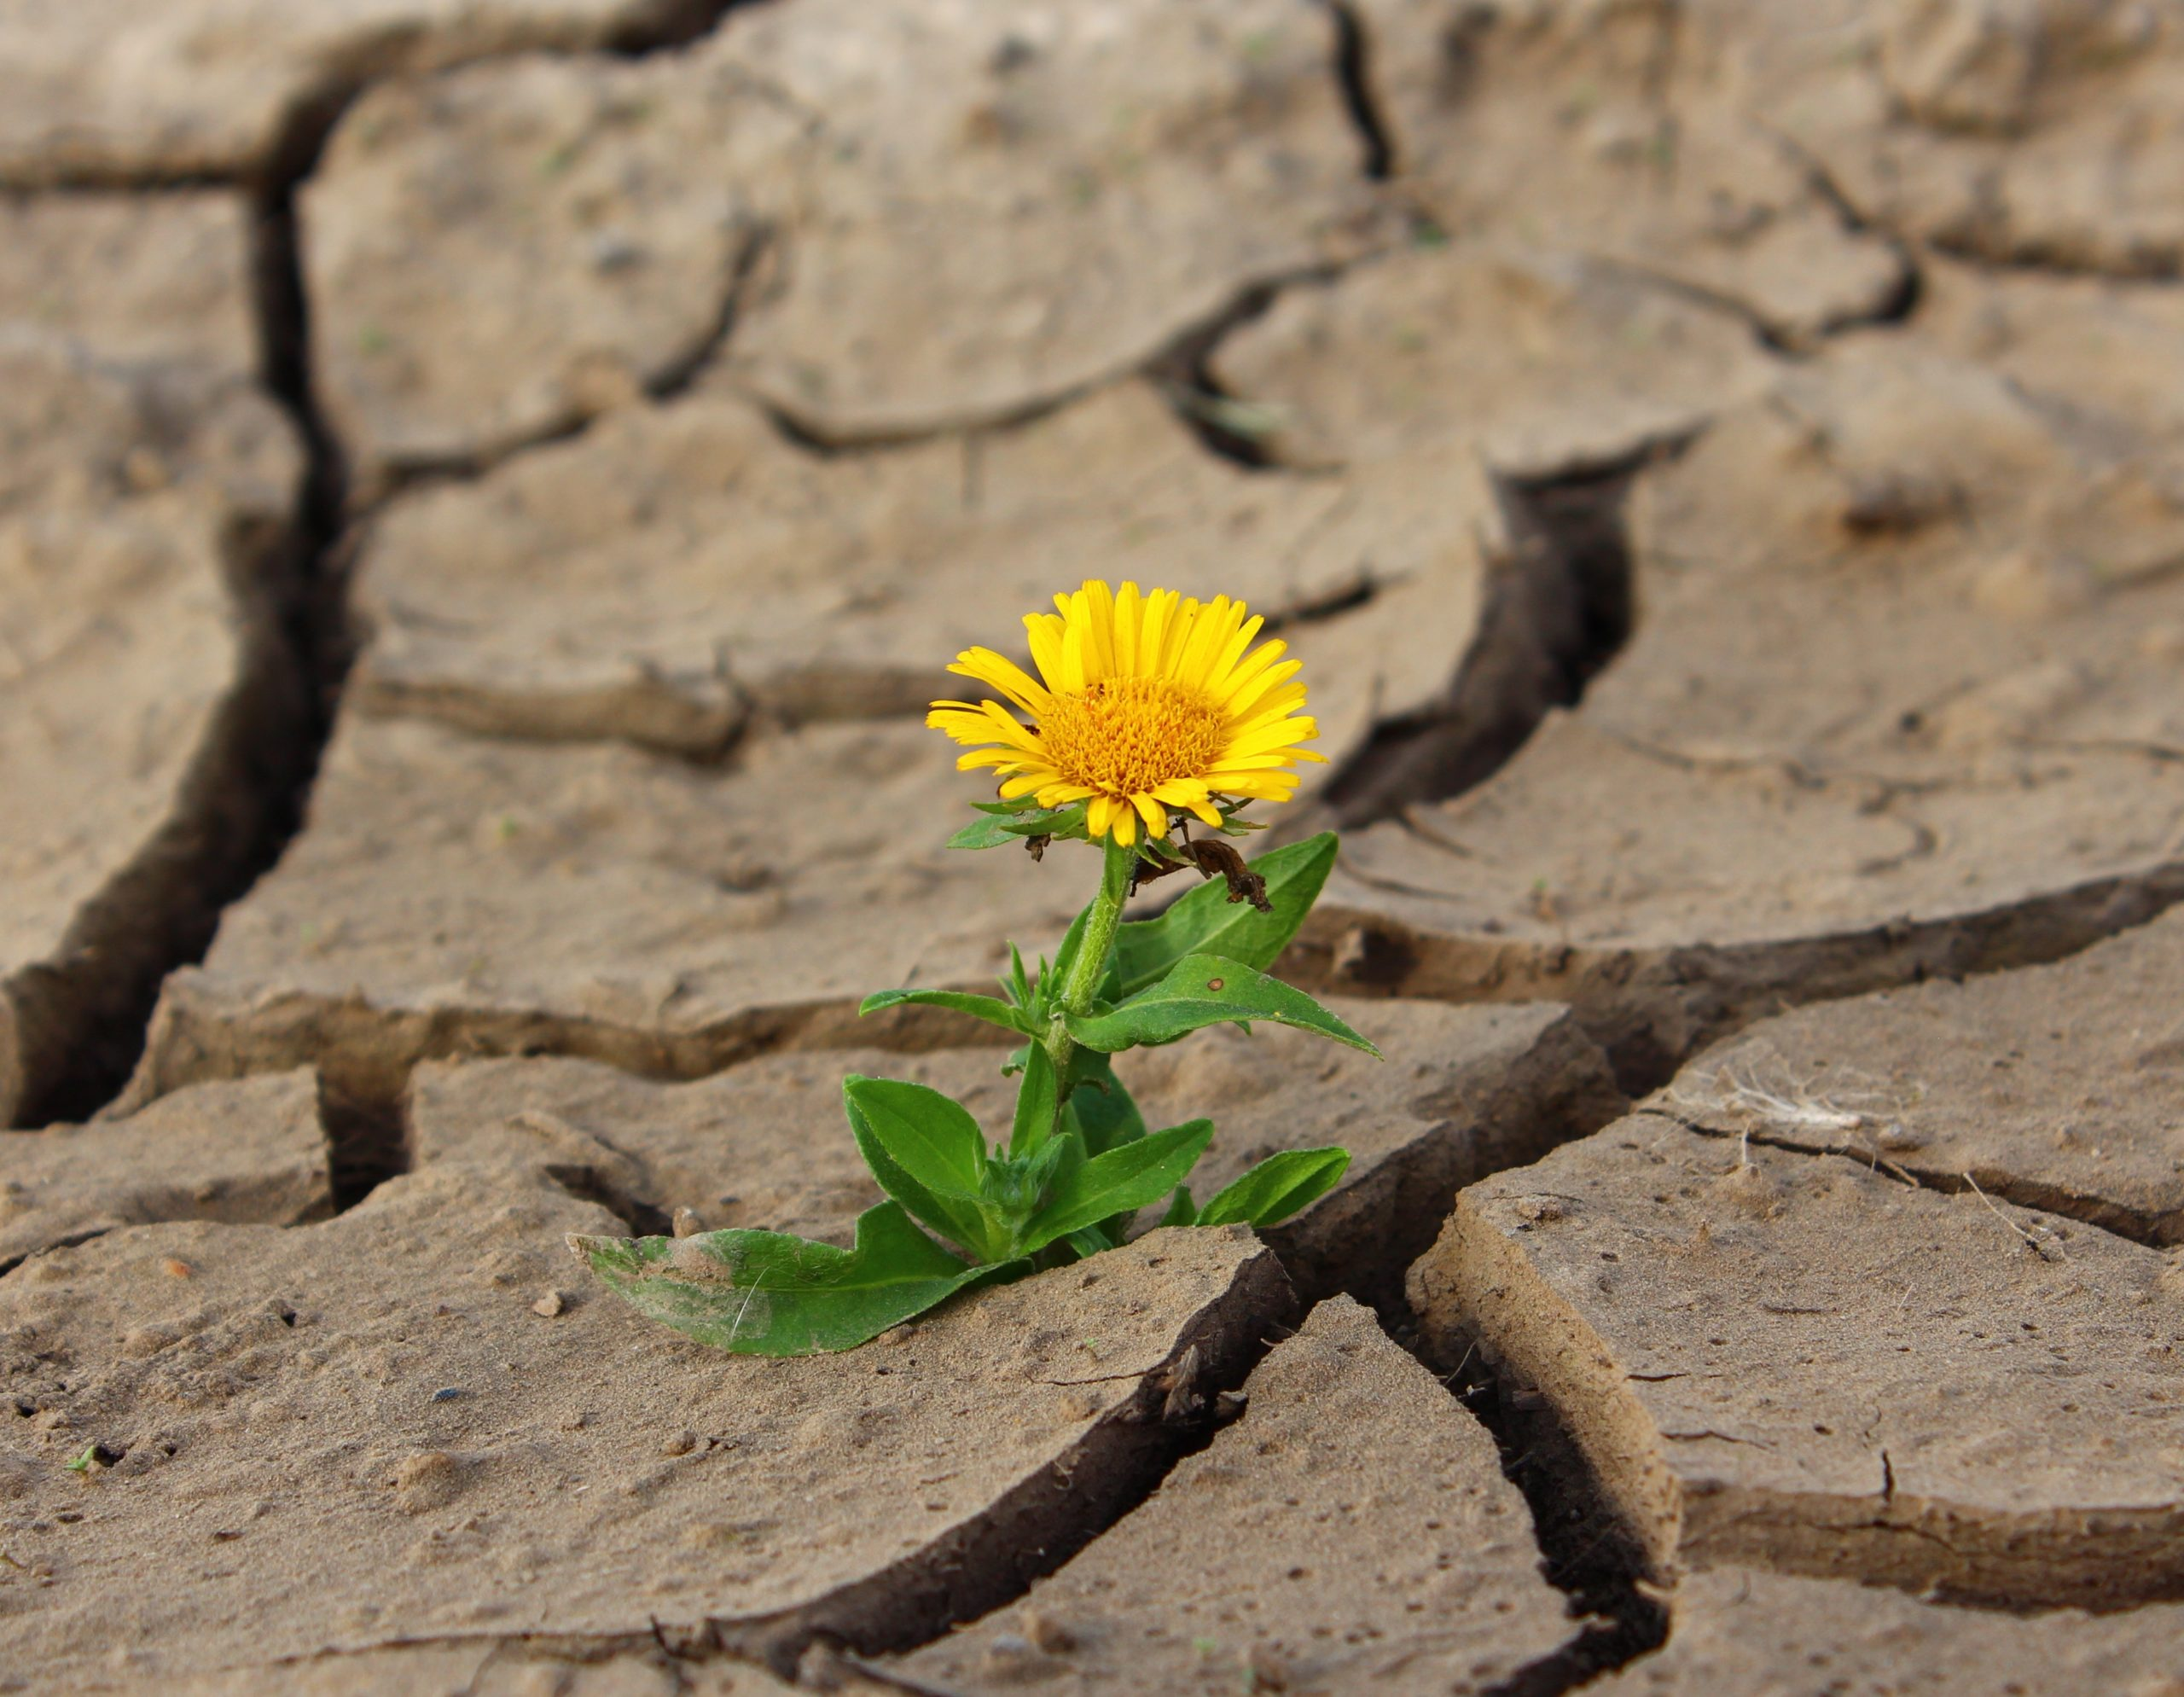 Regaining Power, self-help, empowerment, WildOne Forever